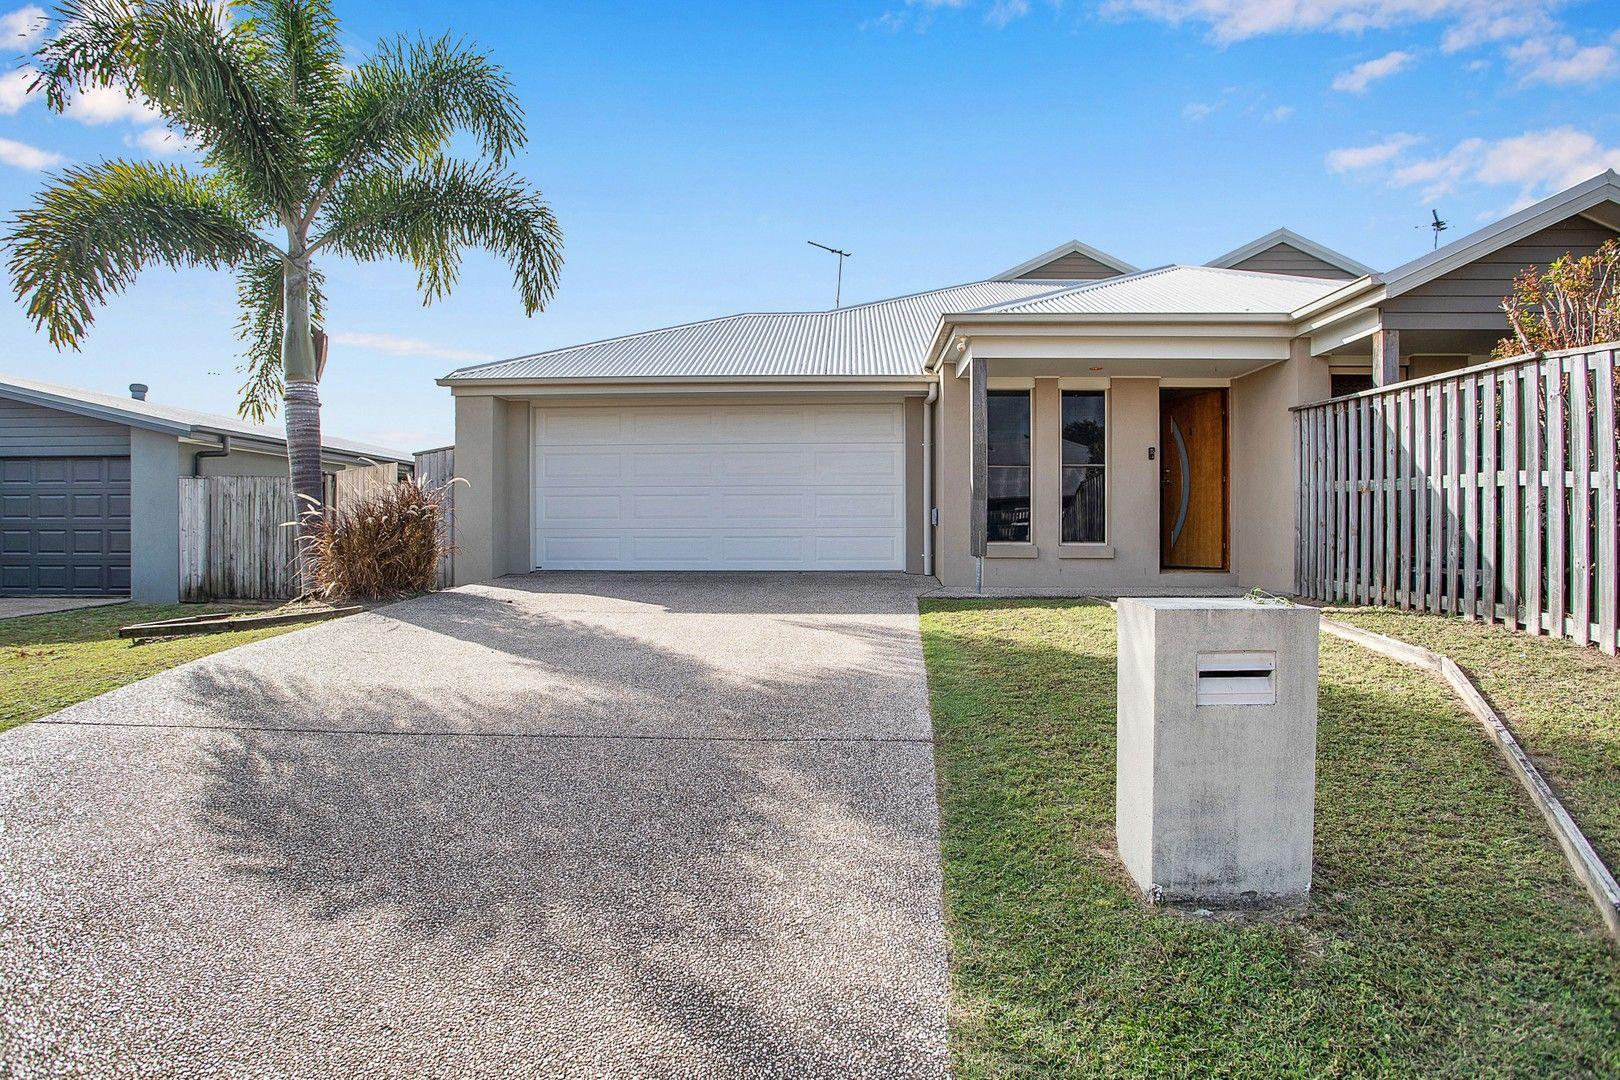 1/40 Schooner Avenue, Bucasia QLD 4750, Image 0